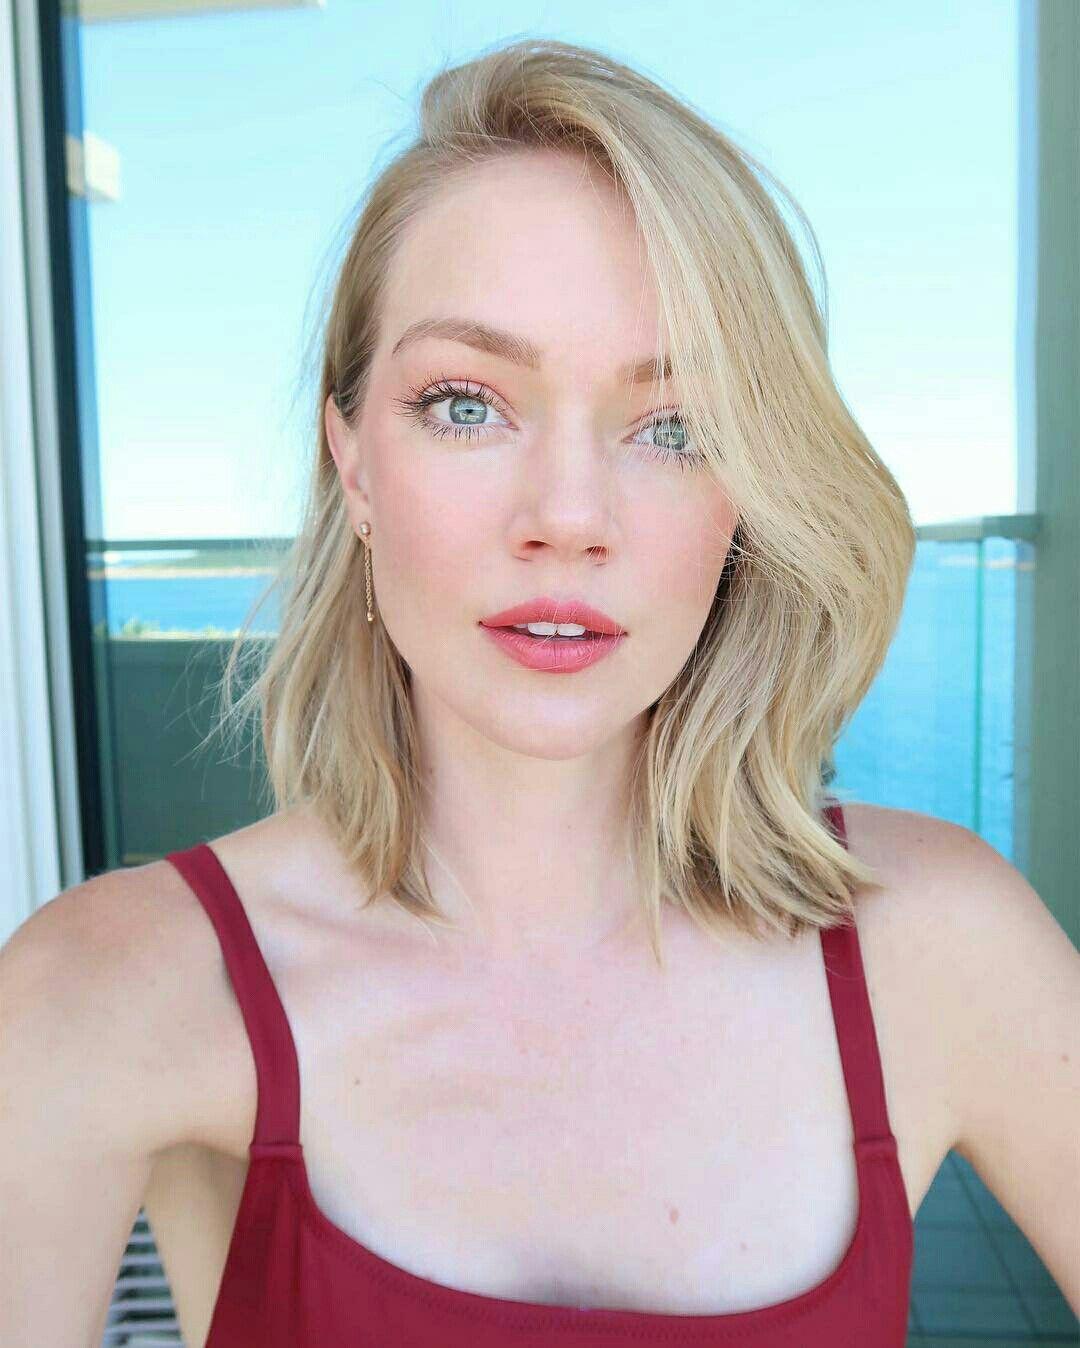 Cleavage Adrienne Bailon nude (62 images), Selfie